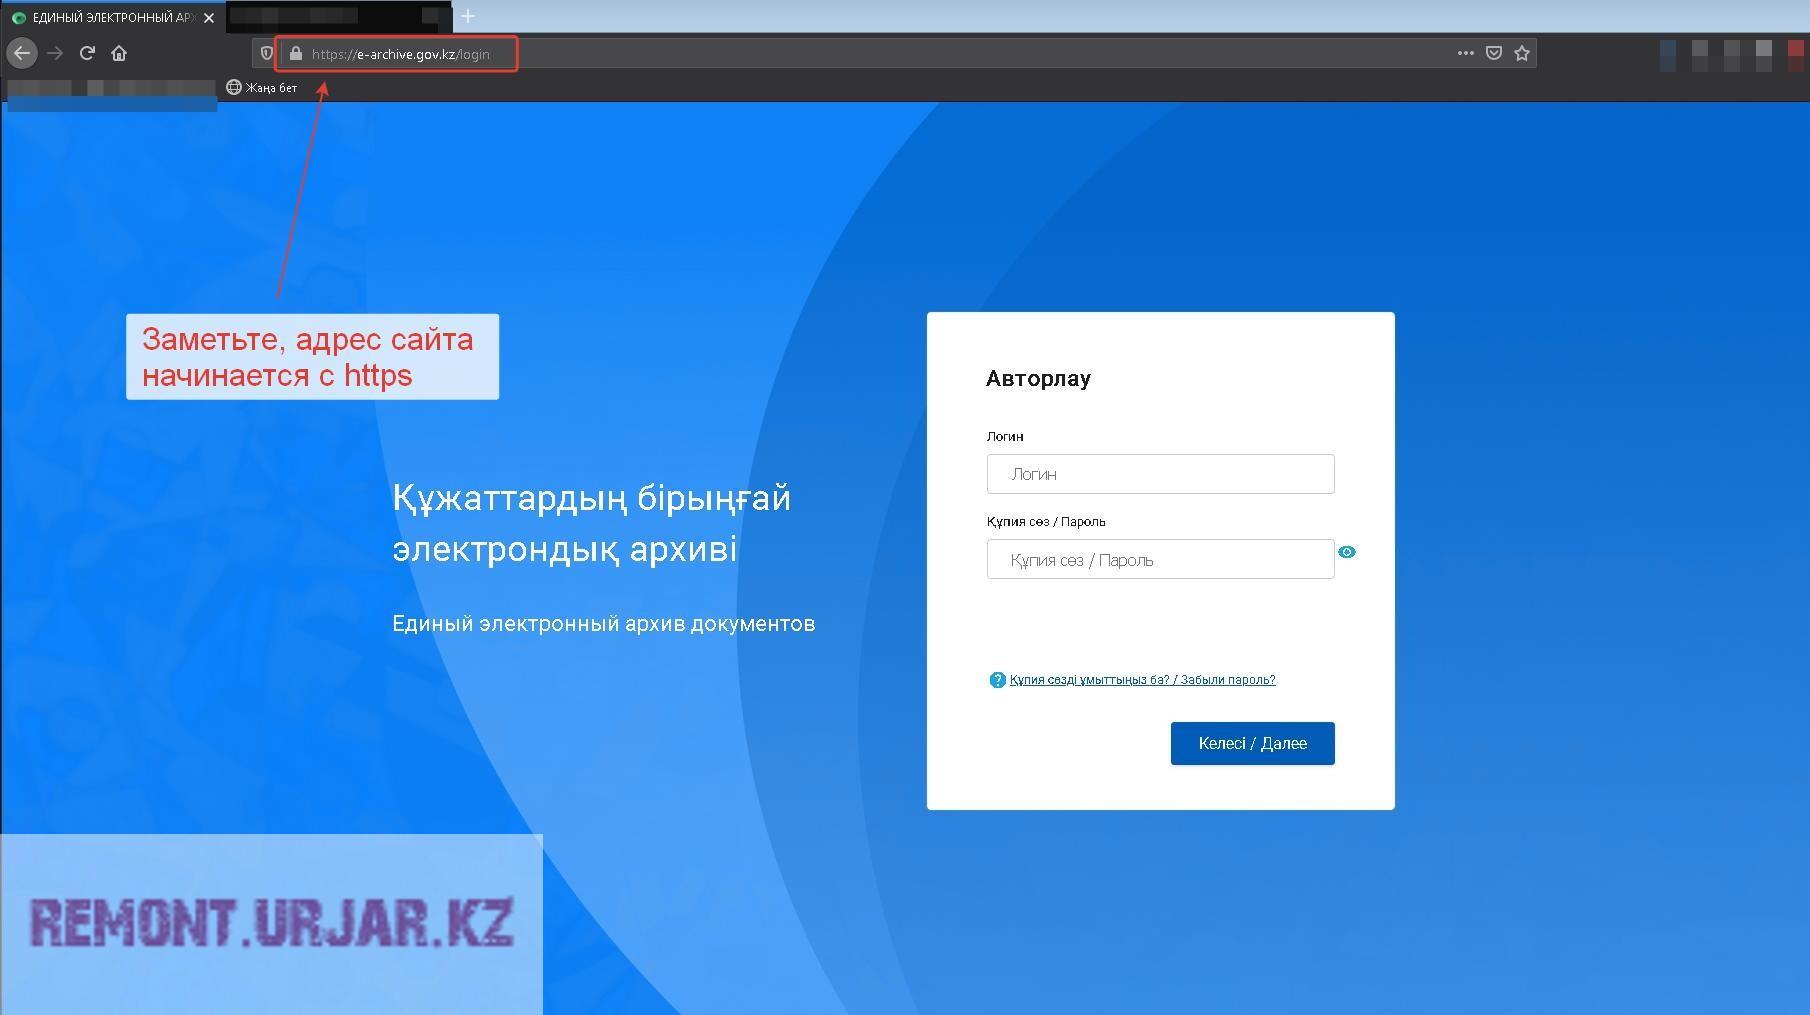 e-archive.gov.kz